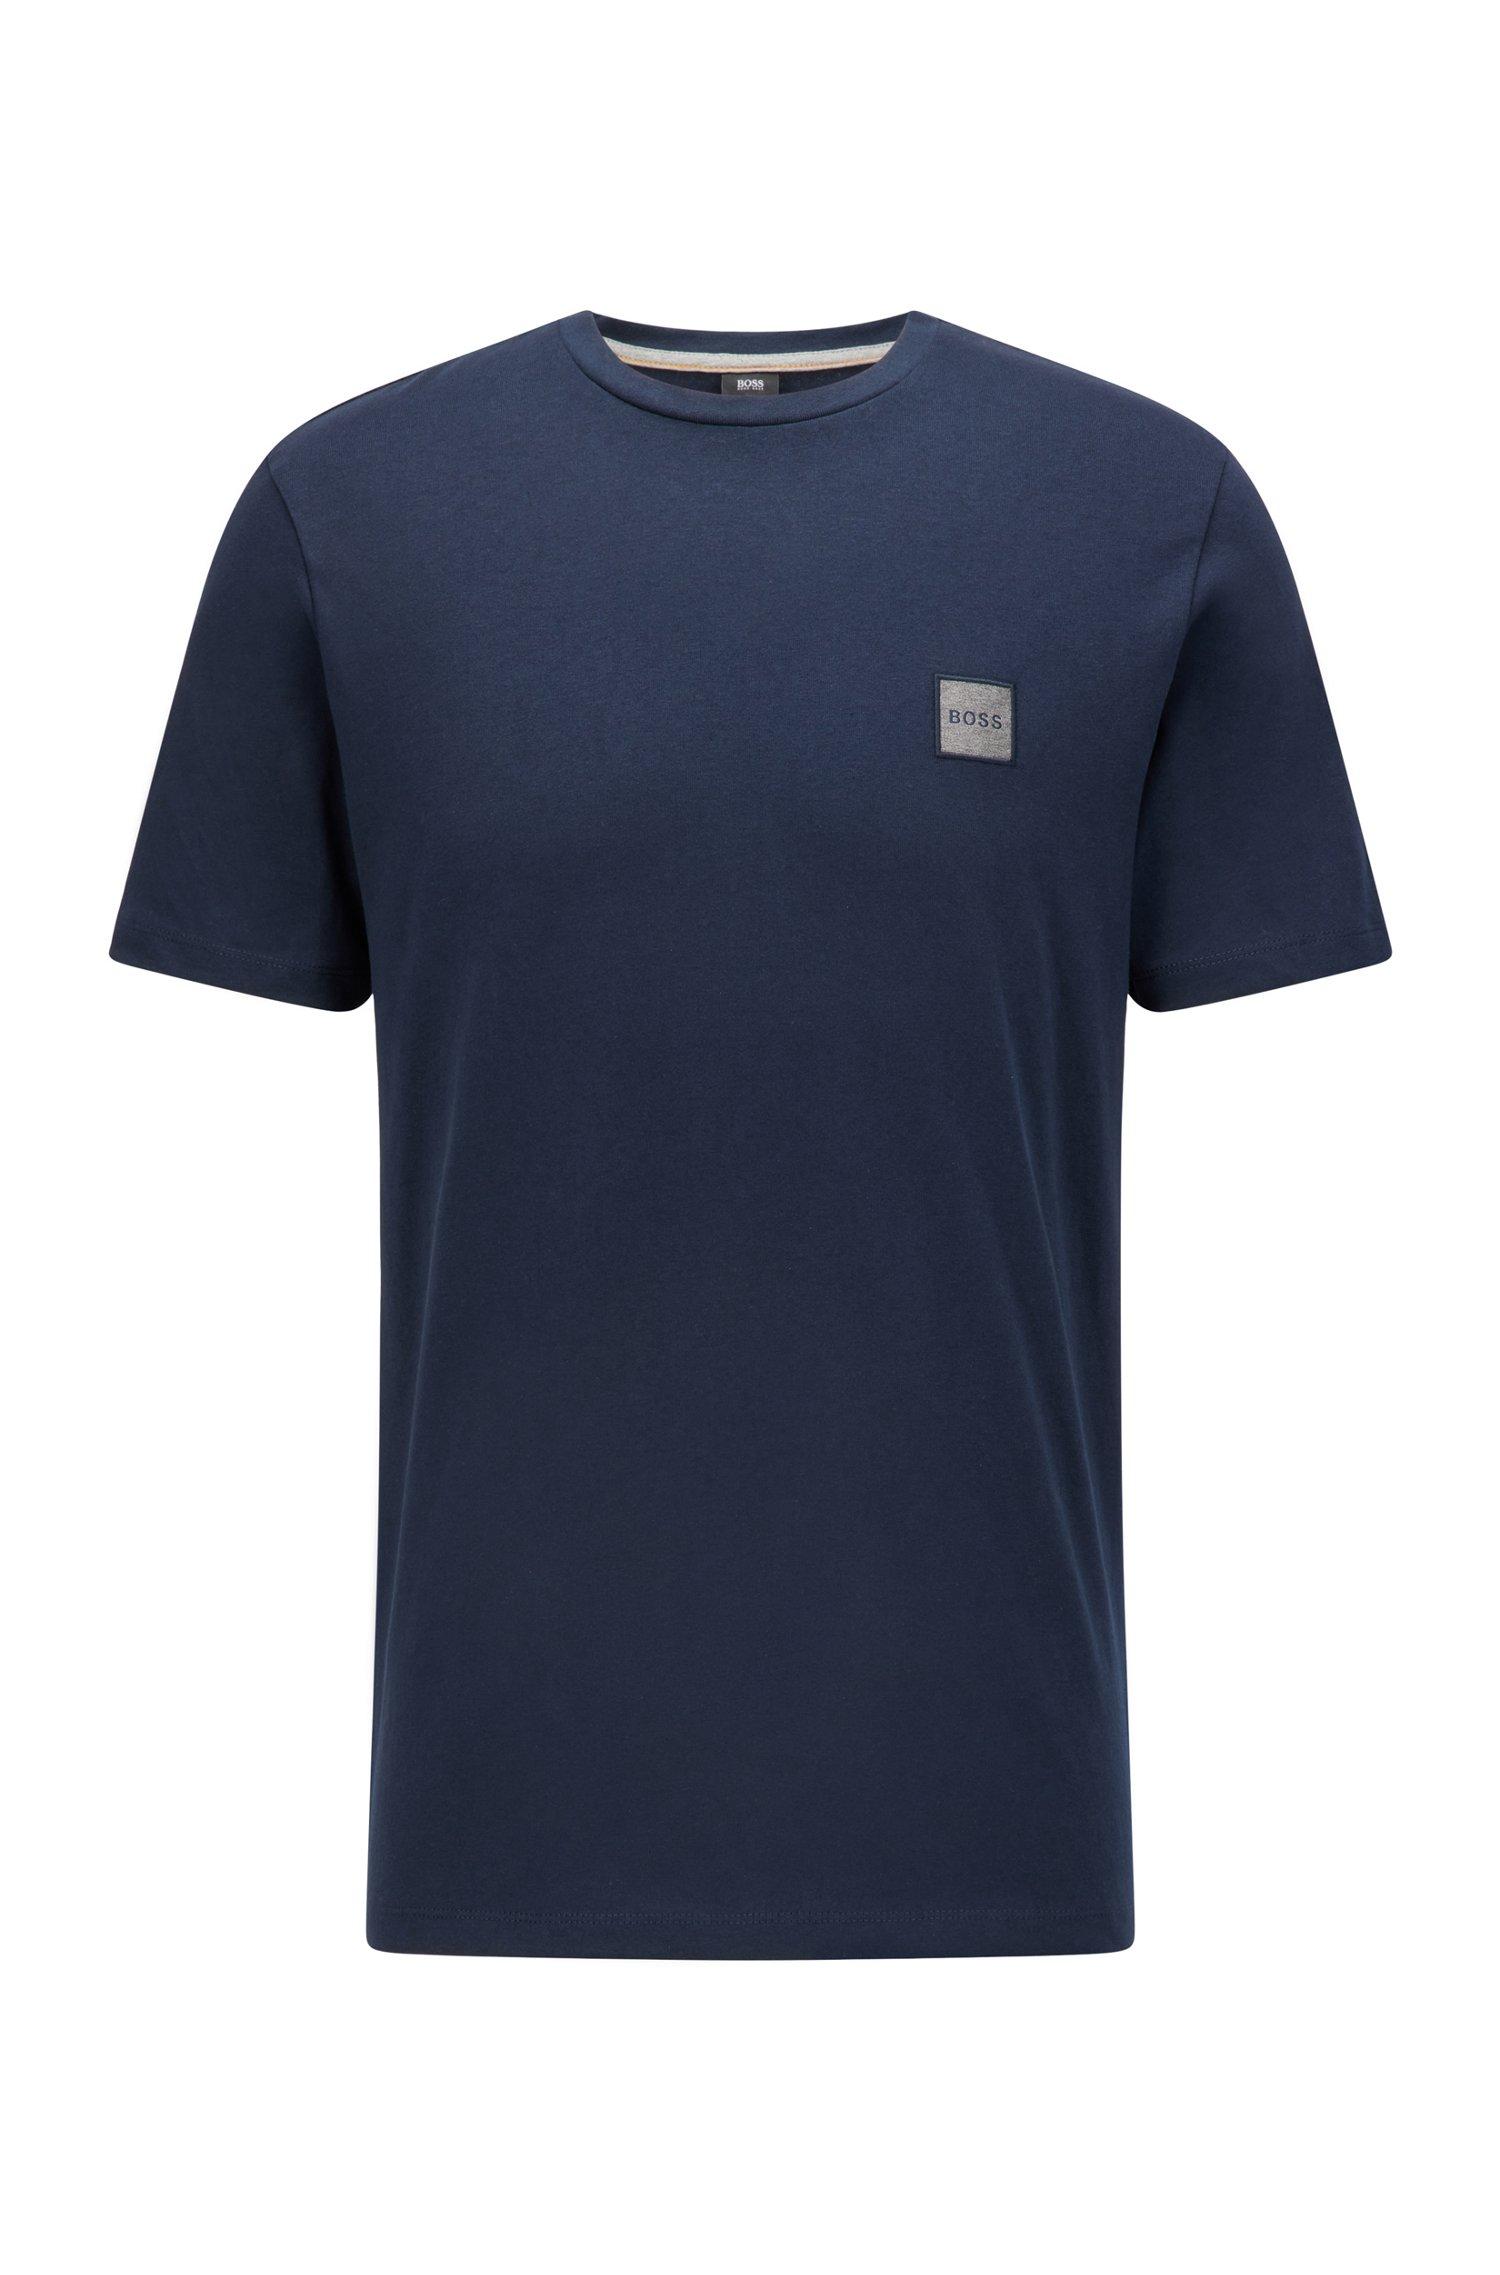 Hugo Boss Crew Neck t-shirt, dark blue, large